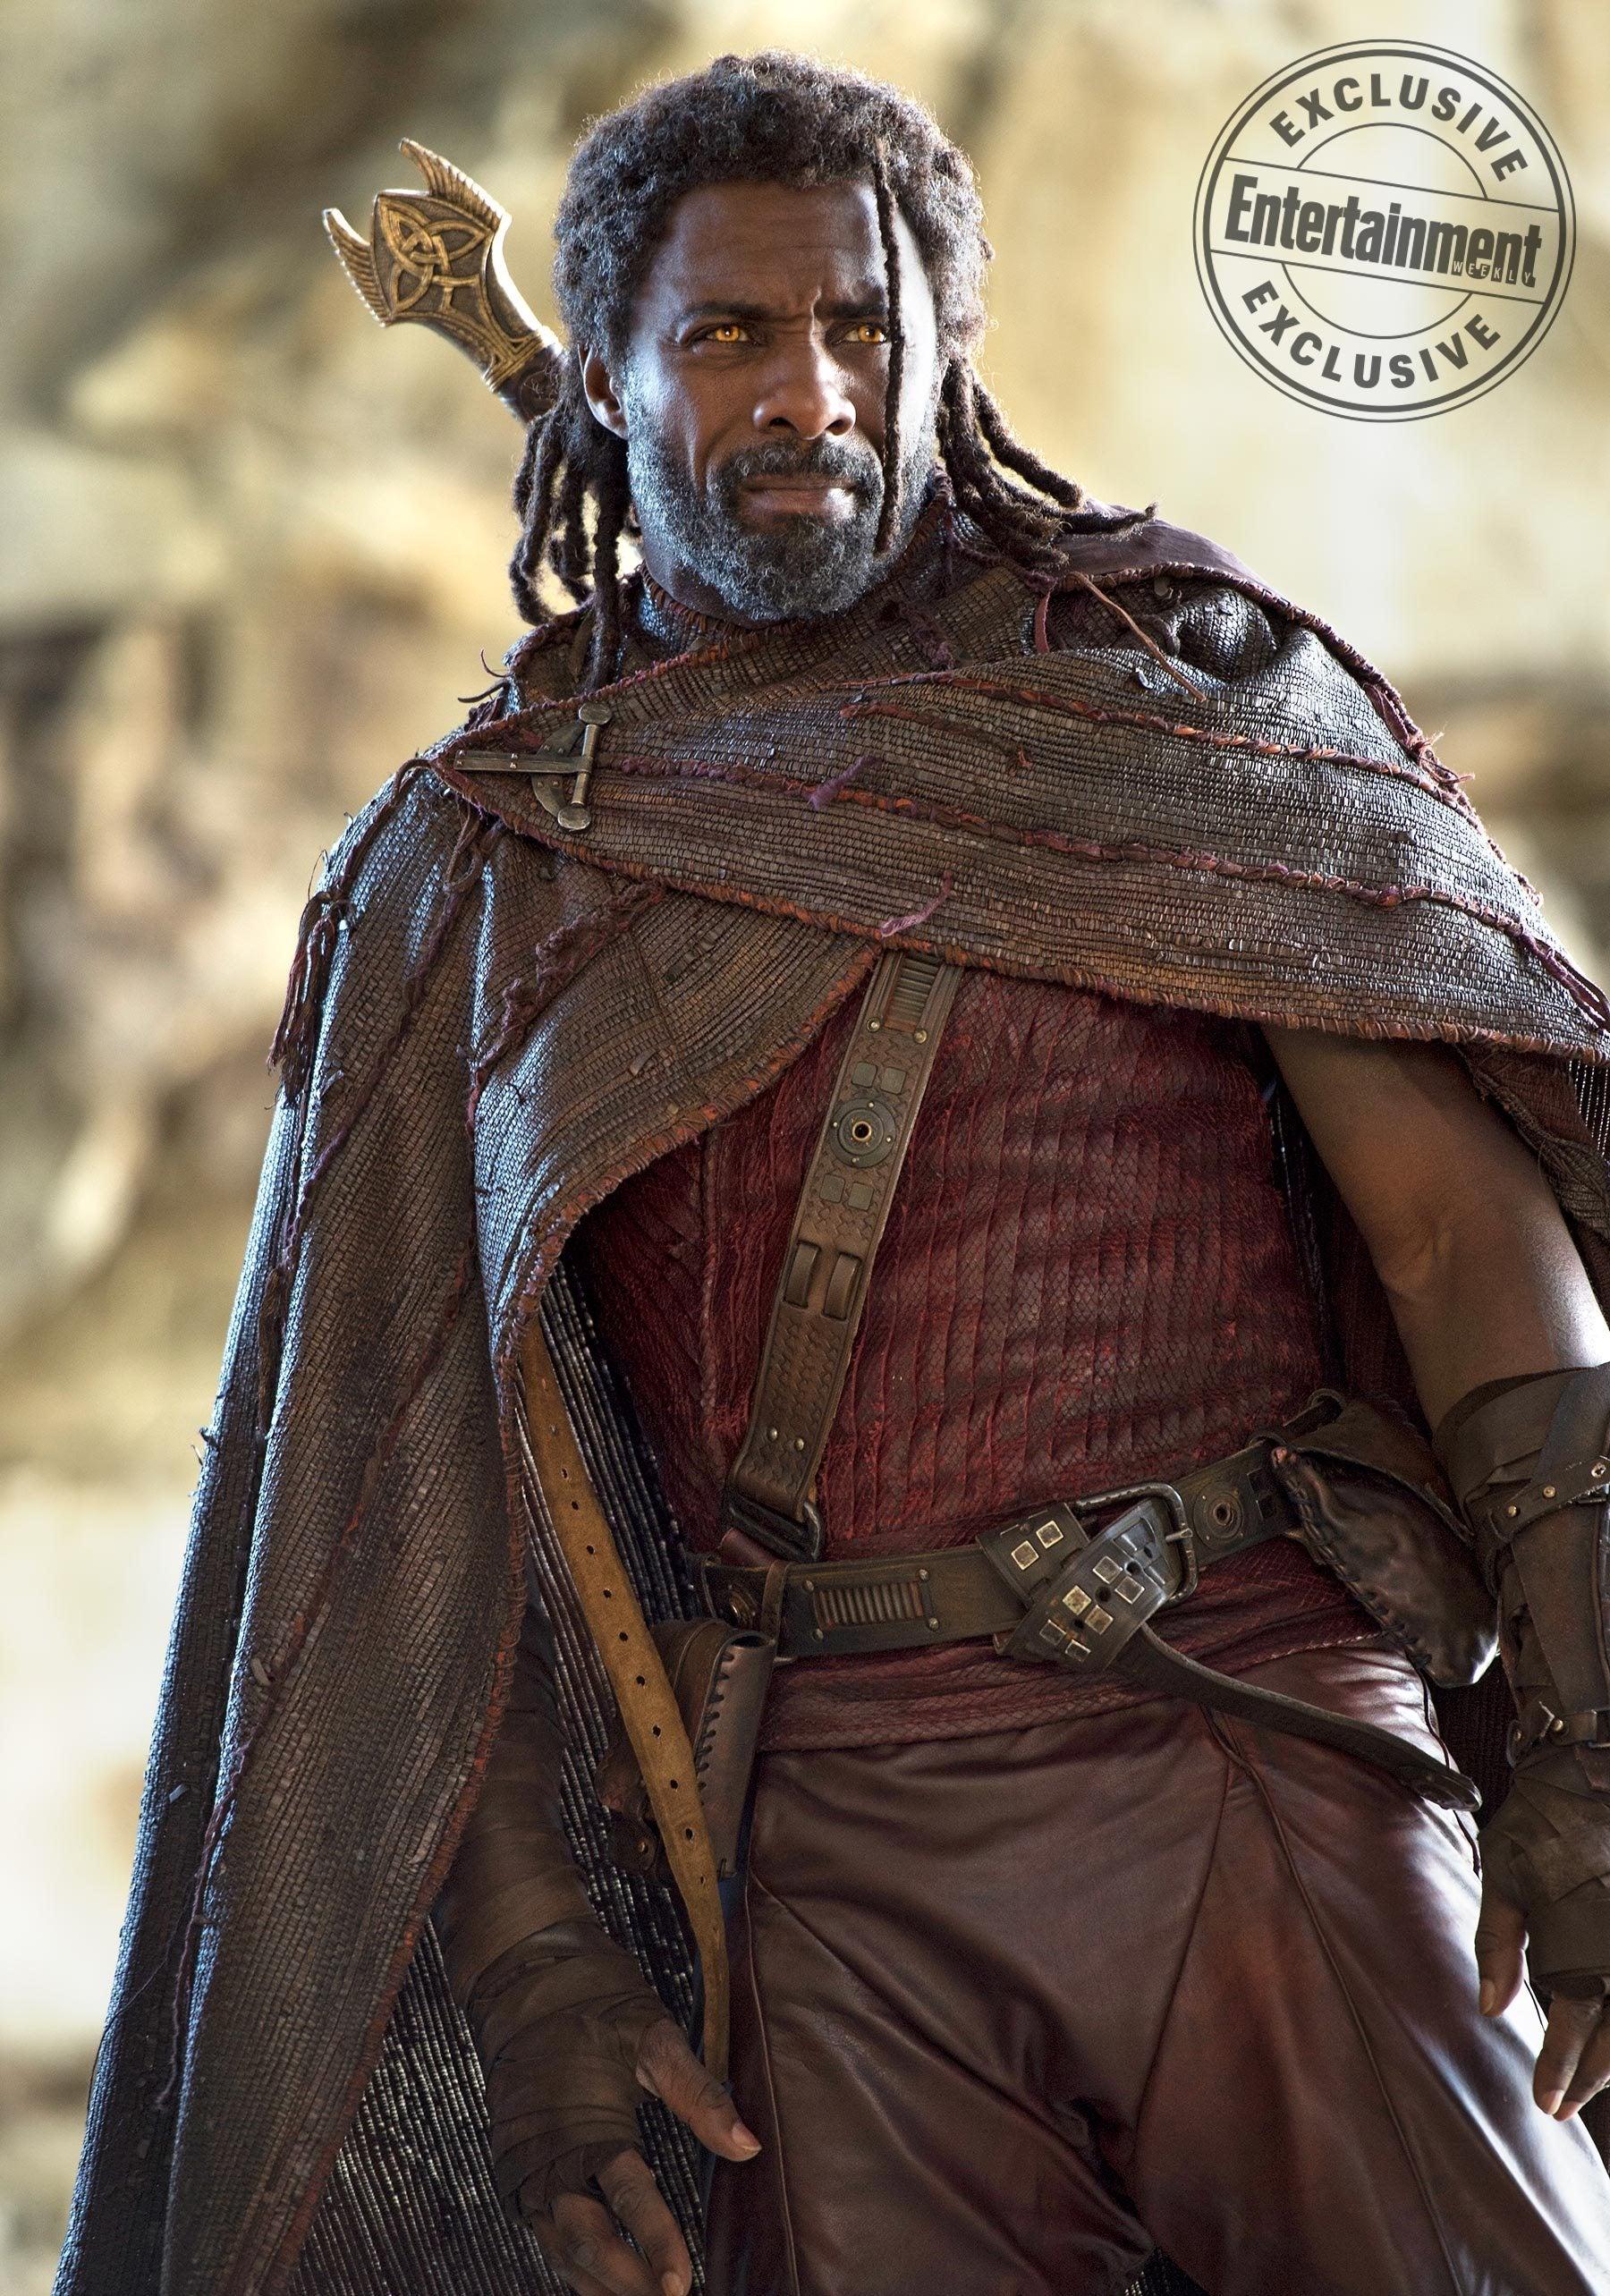 Idris Elba as Heimdall in Thor 3